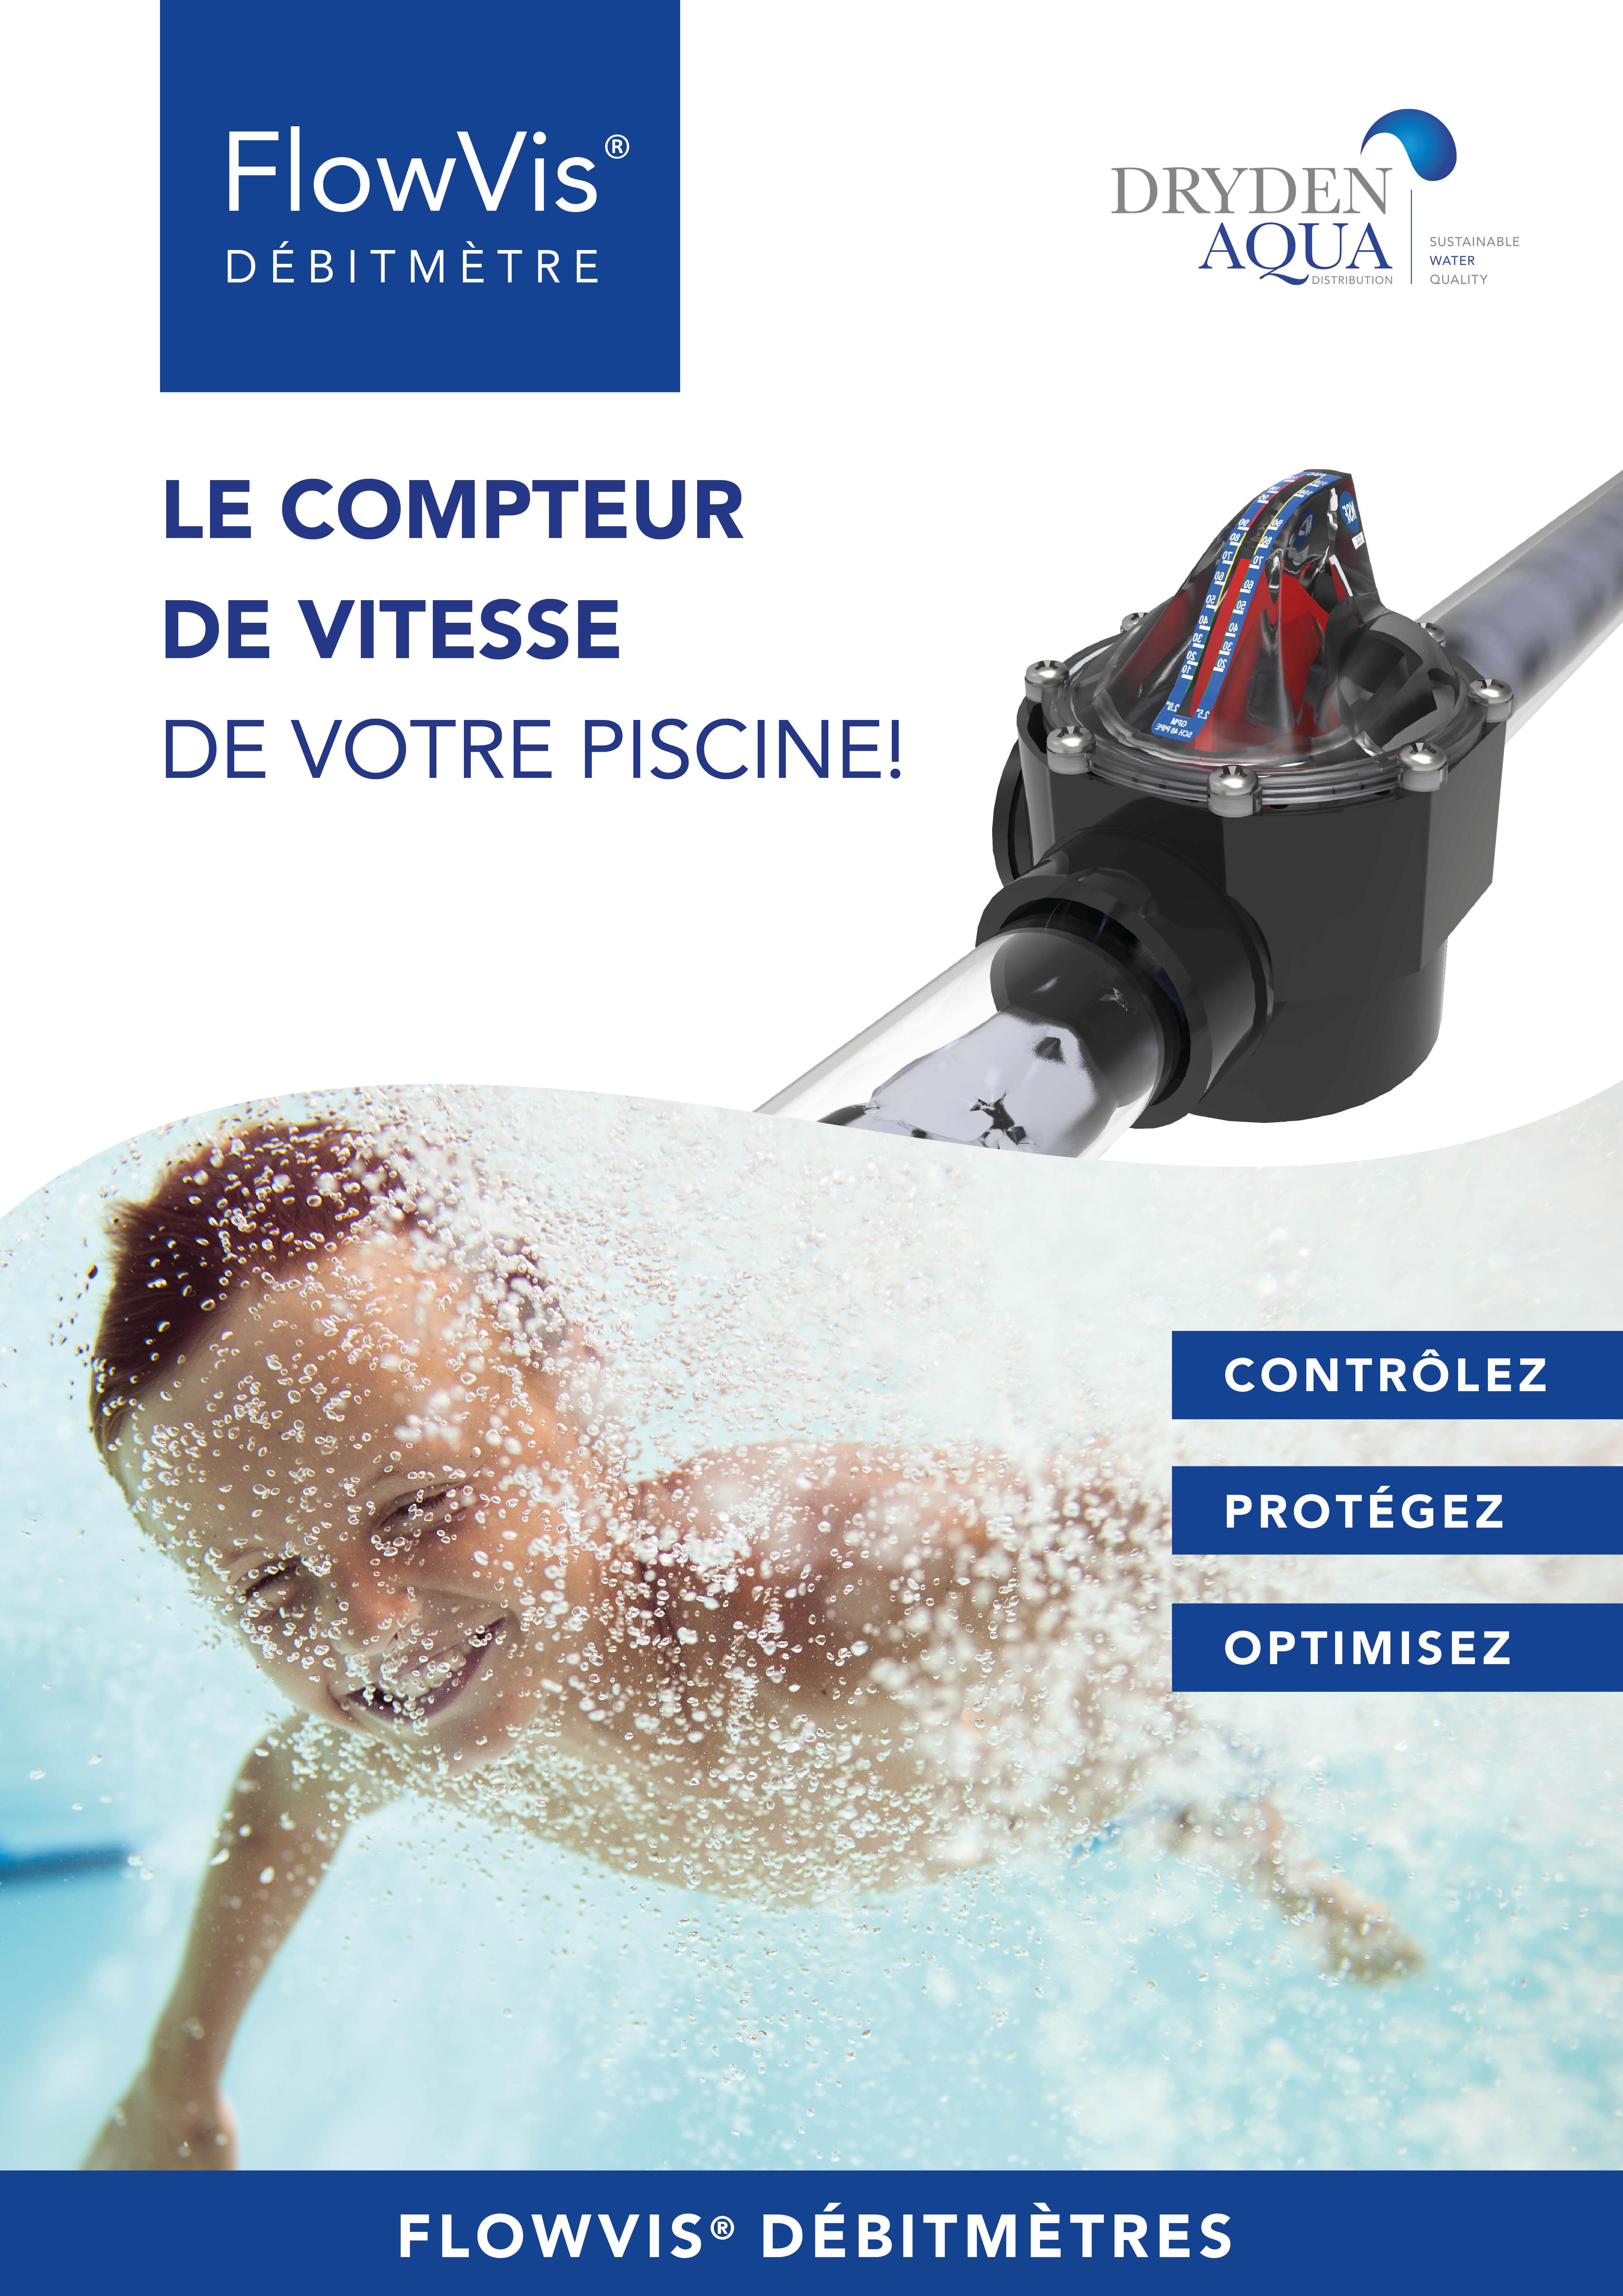 FlowVis + FlowVis Digital French